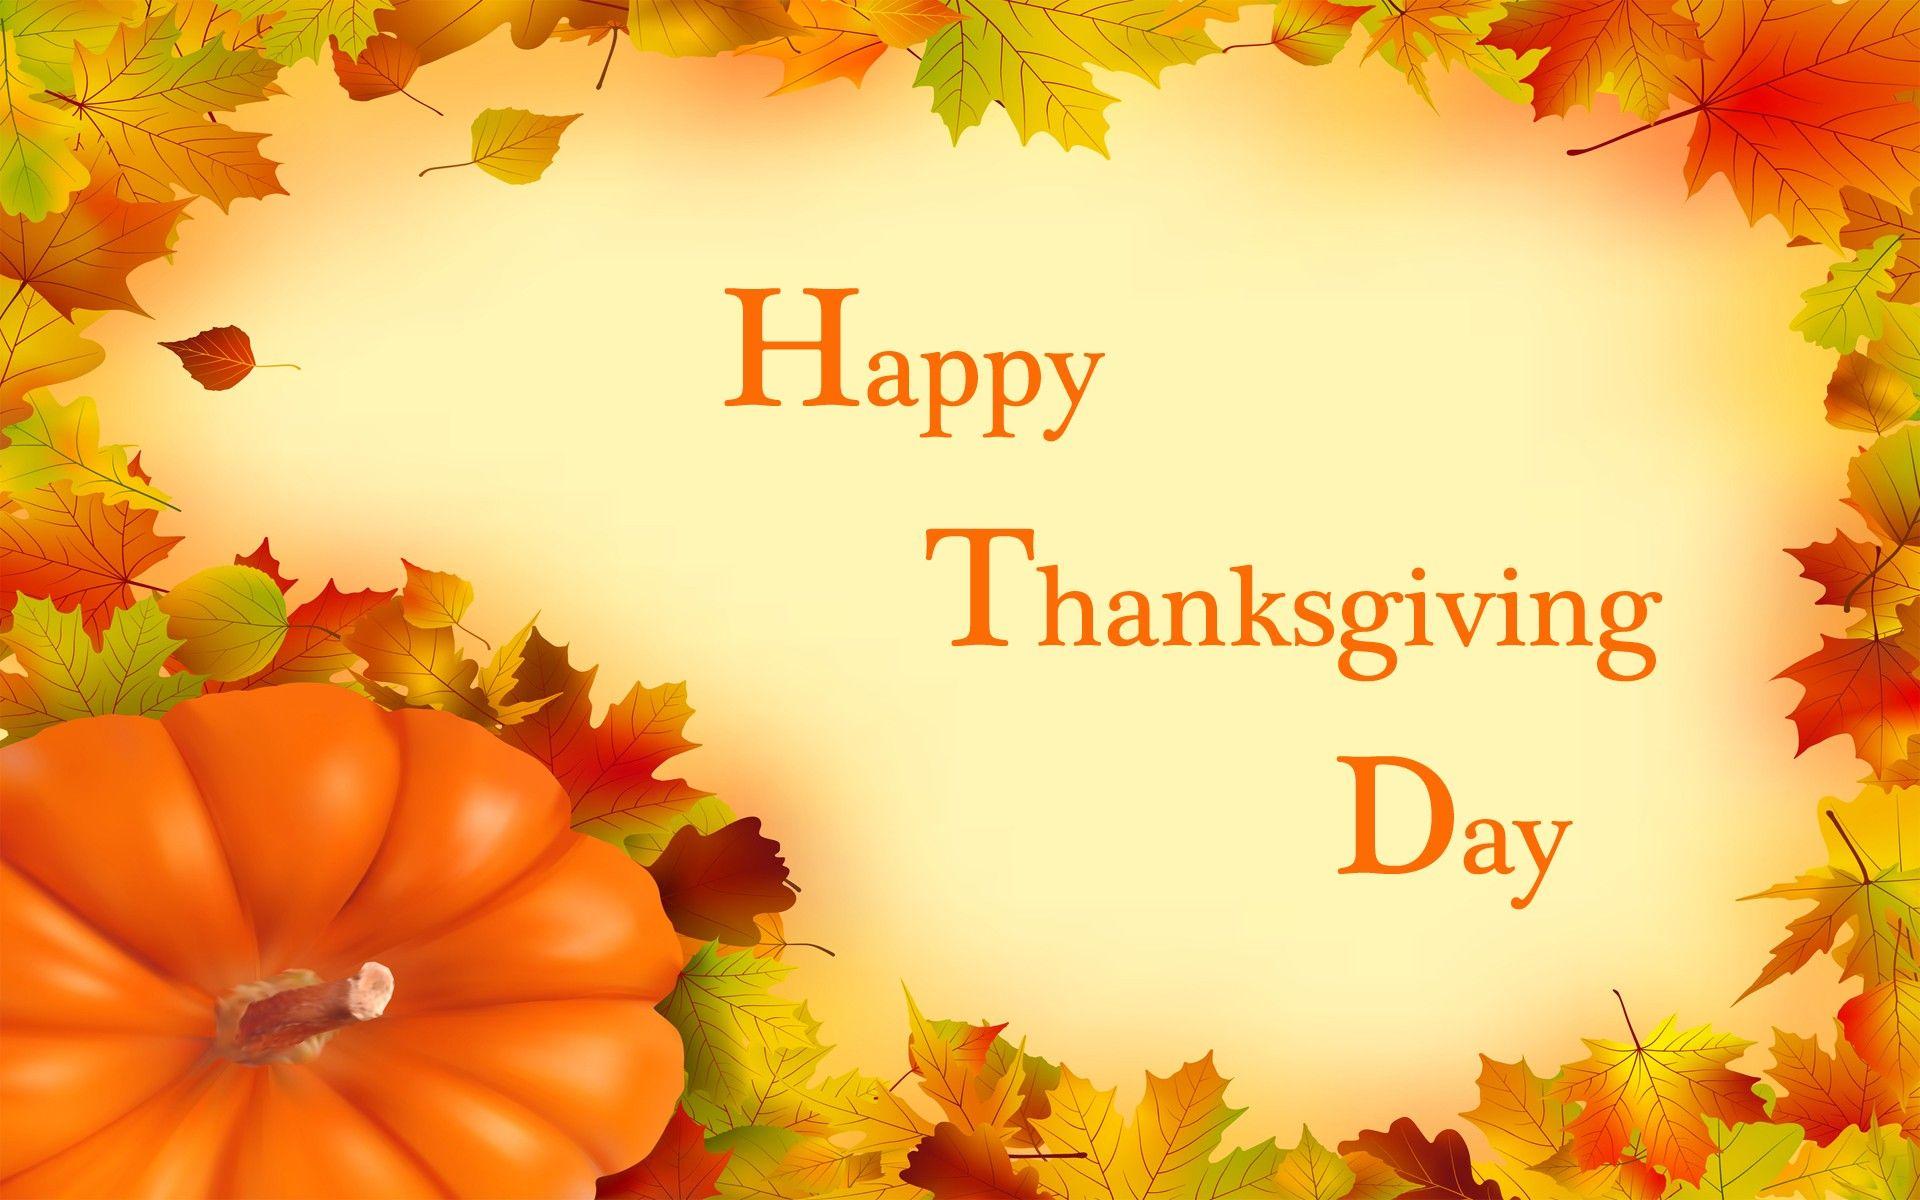 Happy Thanksgiving Day Wallpaper